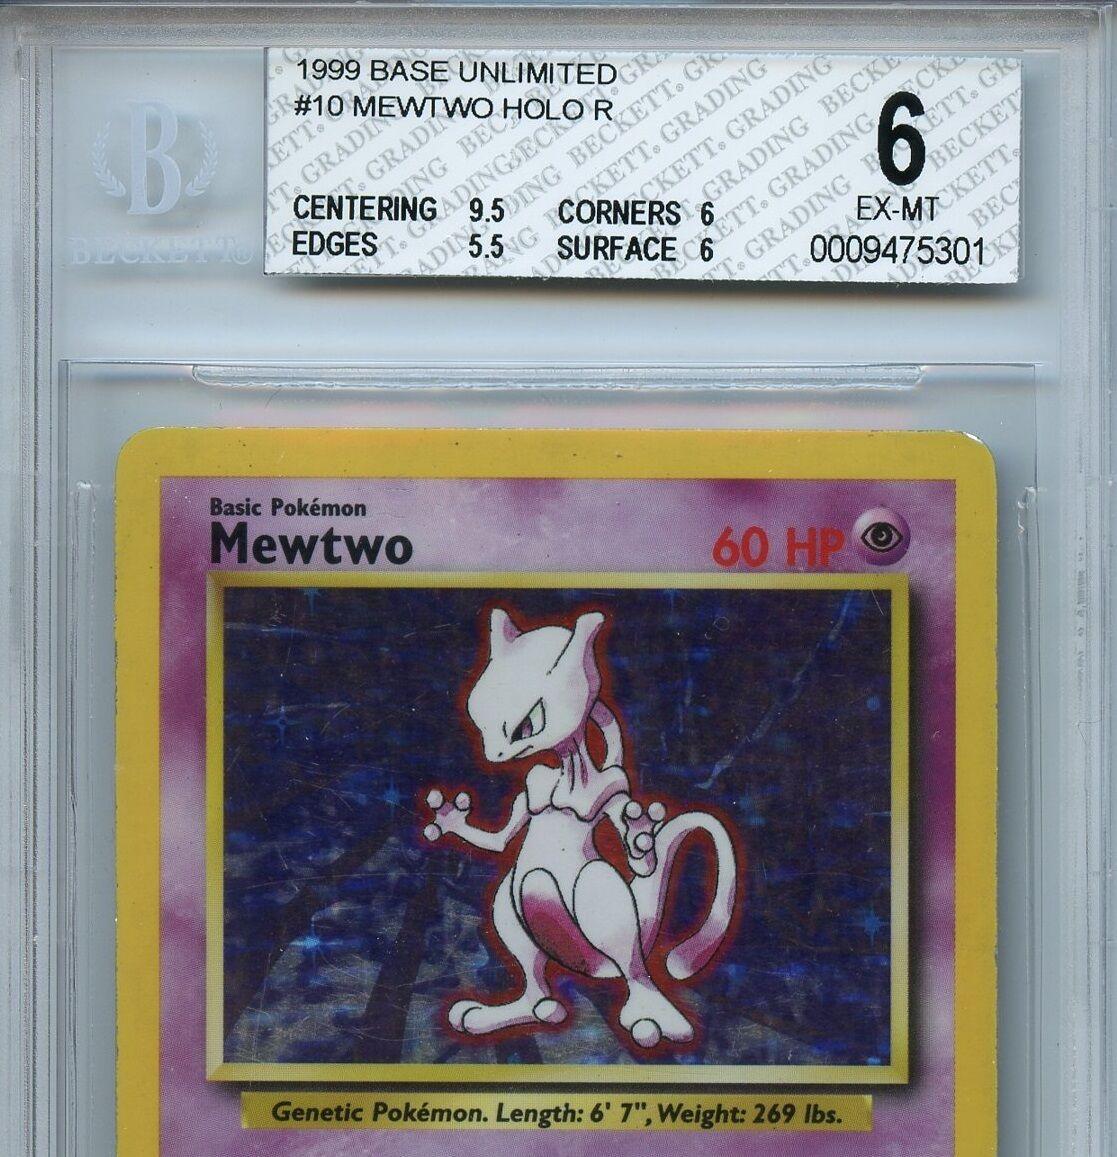 Mewtwo Pokemon Base Unlimited Variant Variant Variant BGS 6 EX-MT+  Holo Card Error 5301 46df57